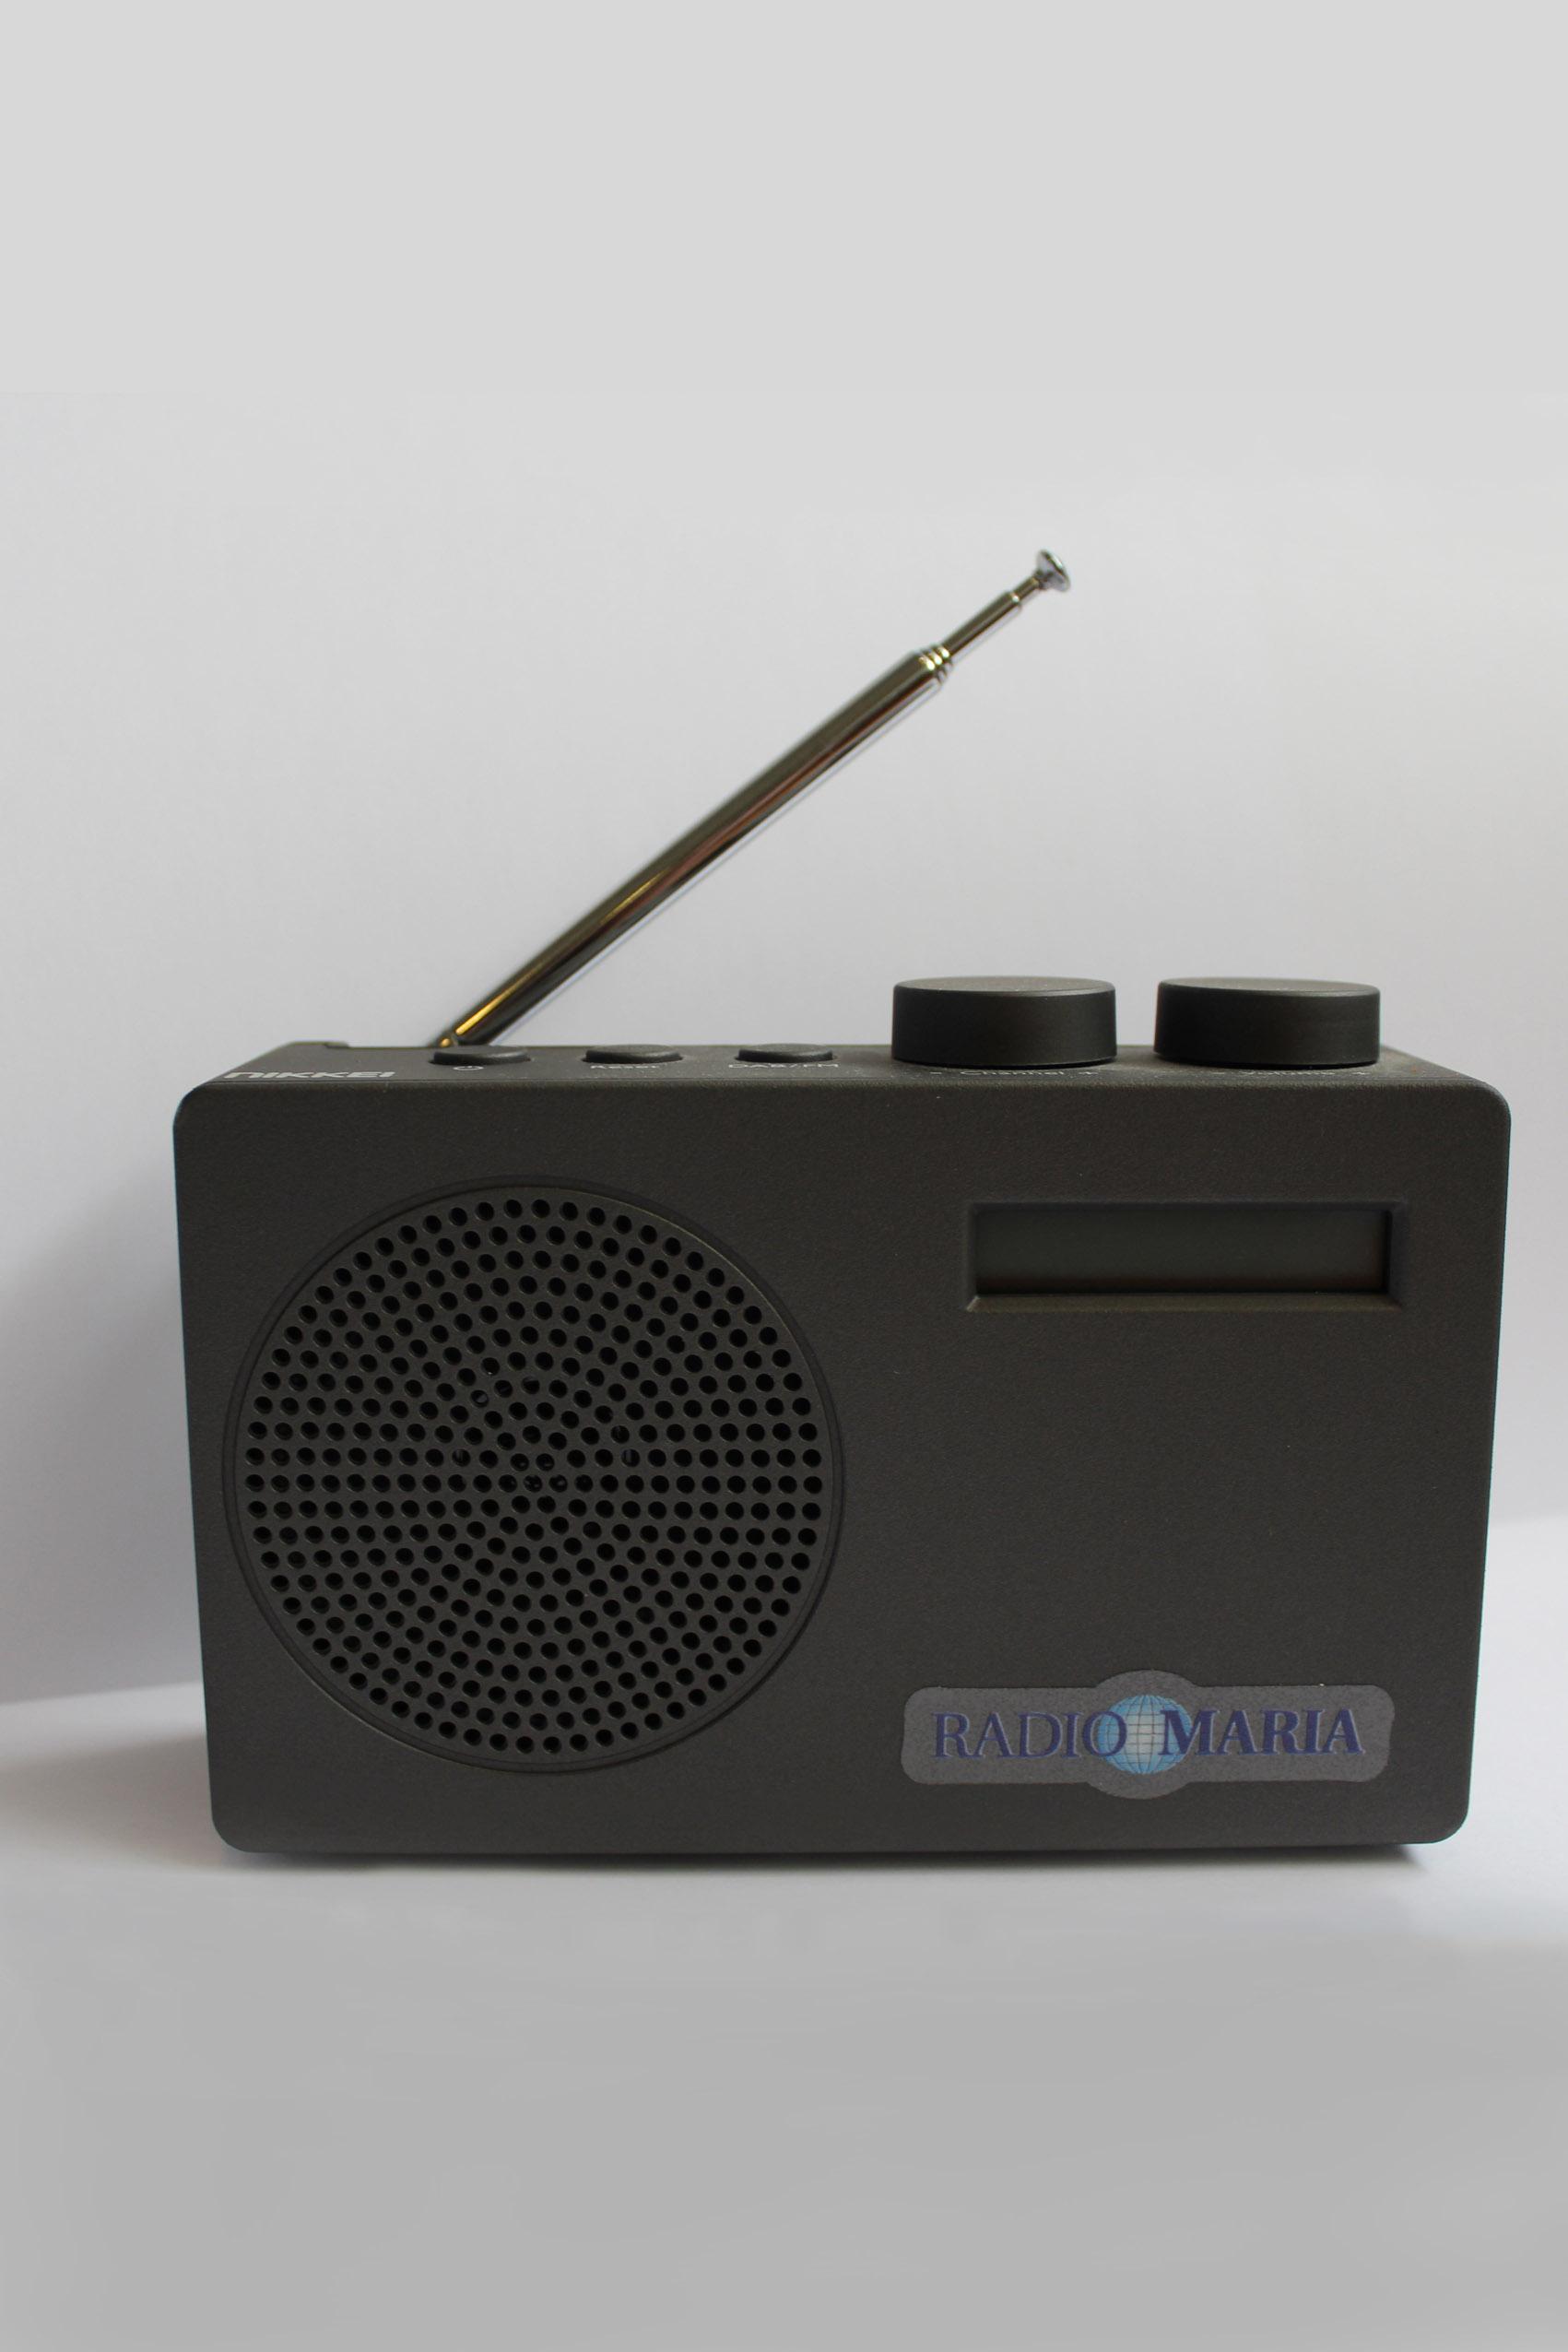 Nikkei radio